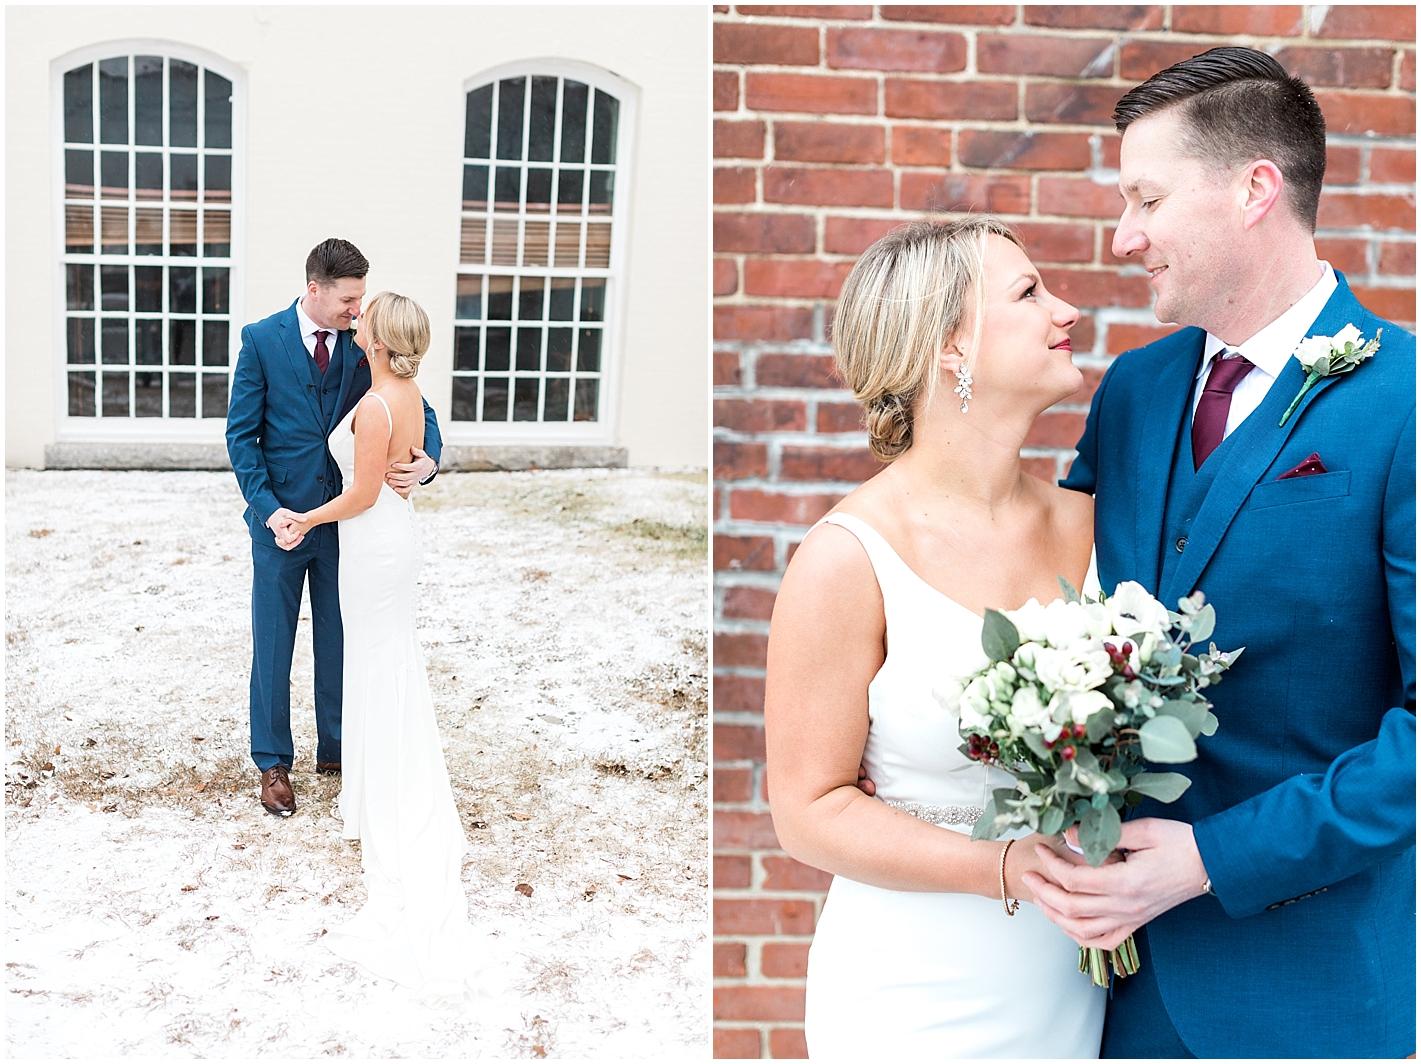 Winter Wedding Bride and Groom Portraits by Alyssa Parker Photography